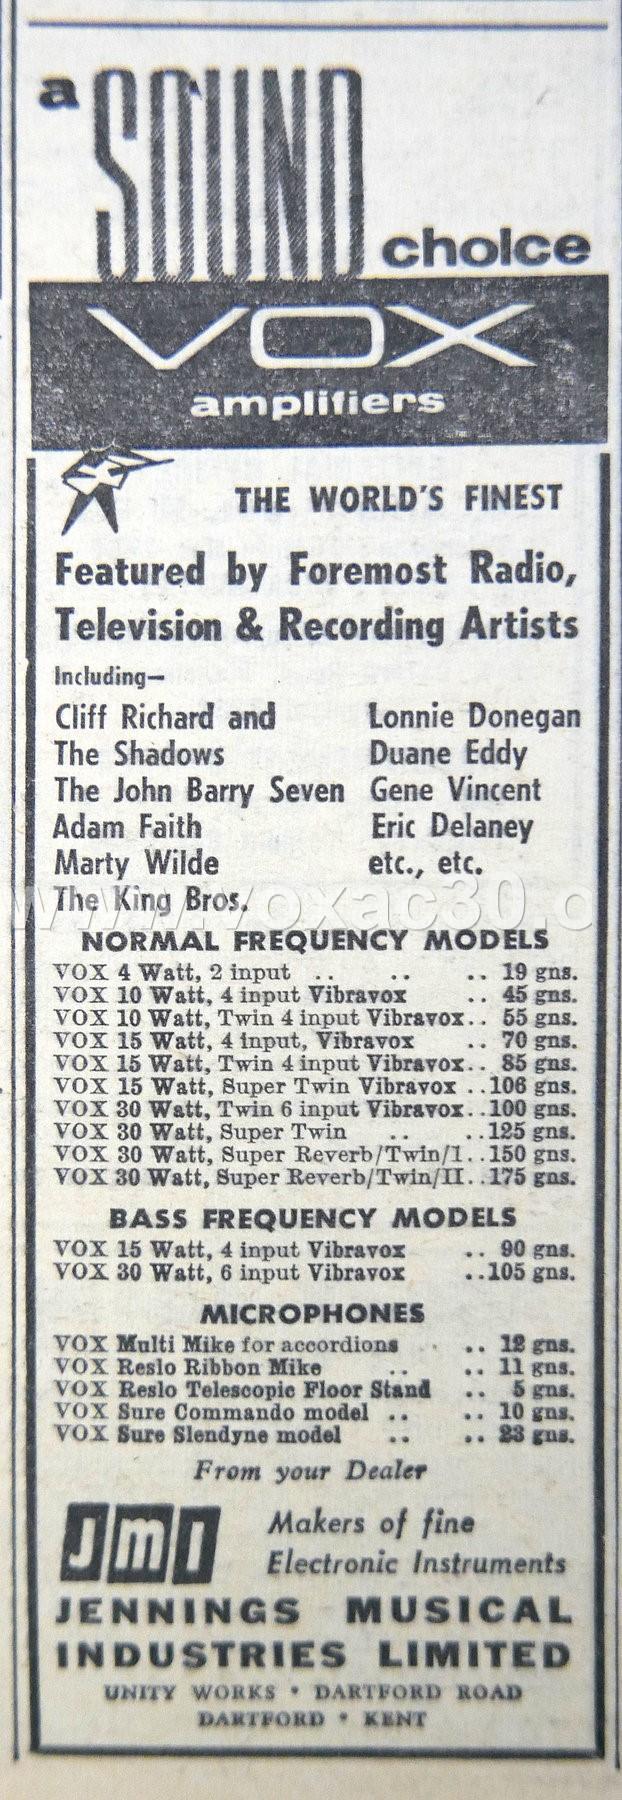 Melody Maker magazine, 25th May, 1962